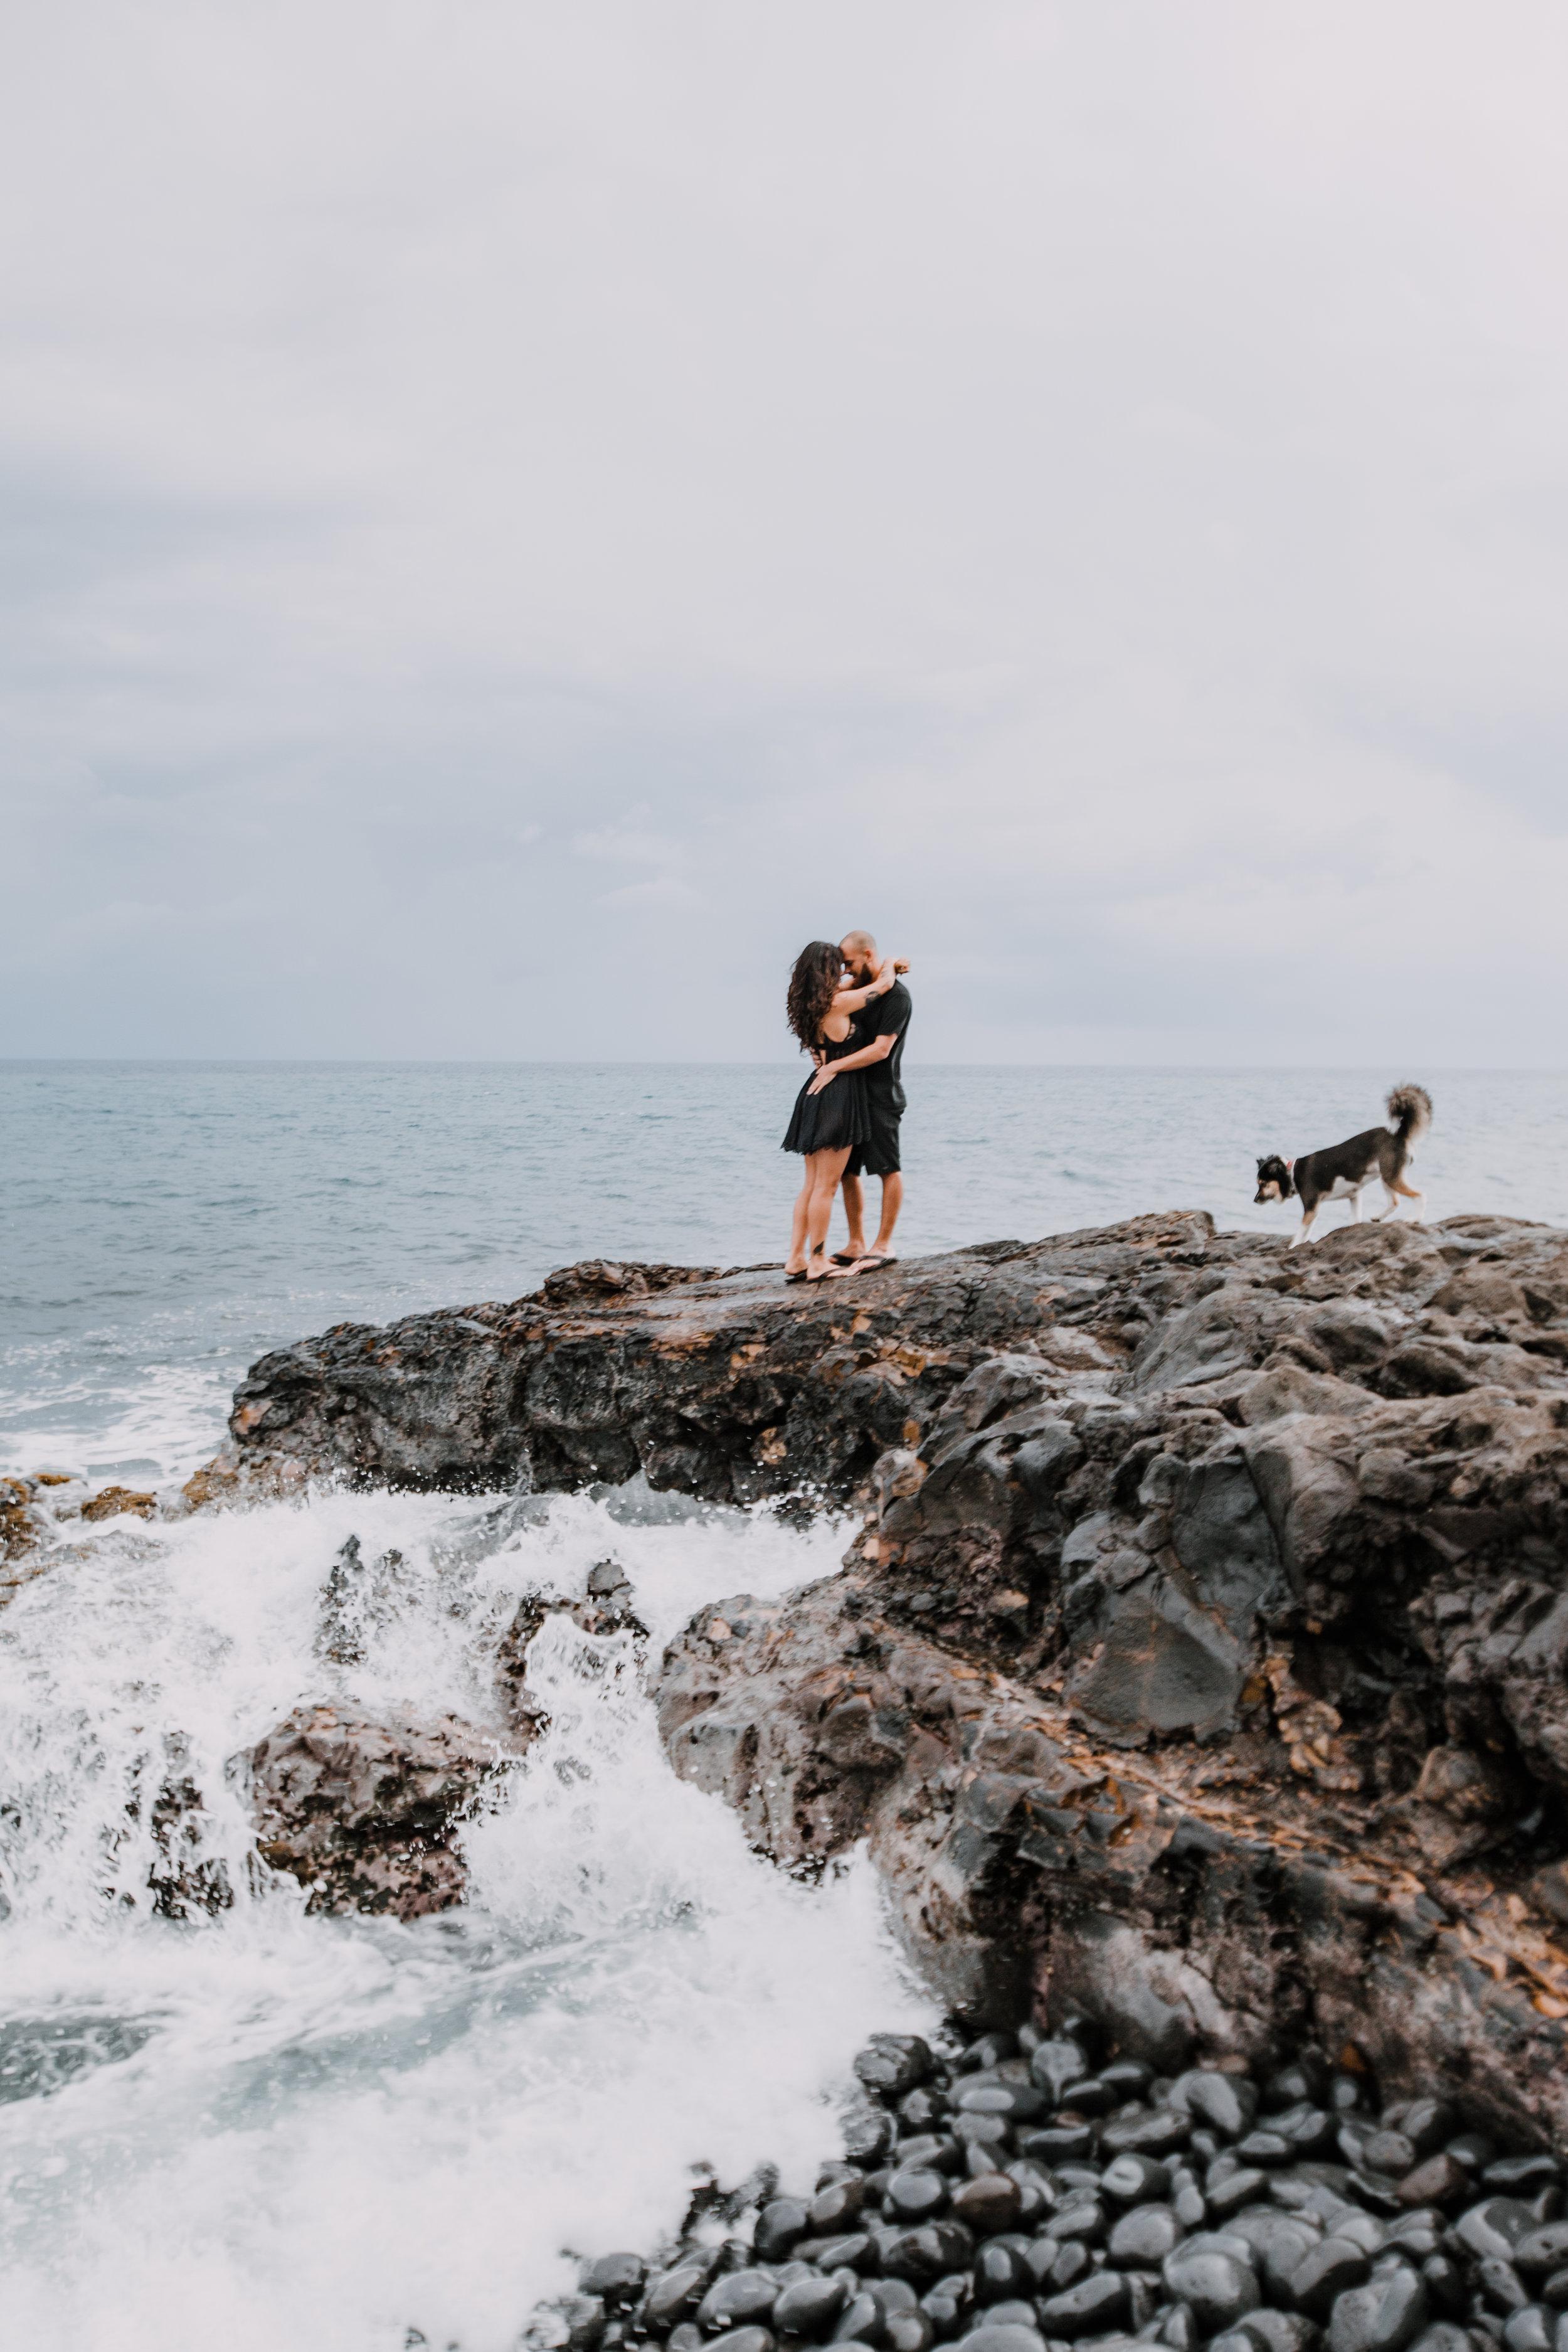 kaupo beach, hawaiian volcanic eruption, lava rock, haleakala national park, hawaii wedding photographer, hawaii elopement photographer, maui wedding, maui engagements, maui elopement